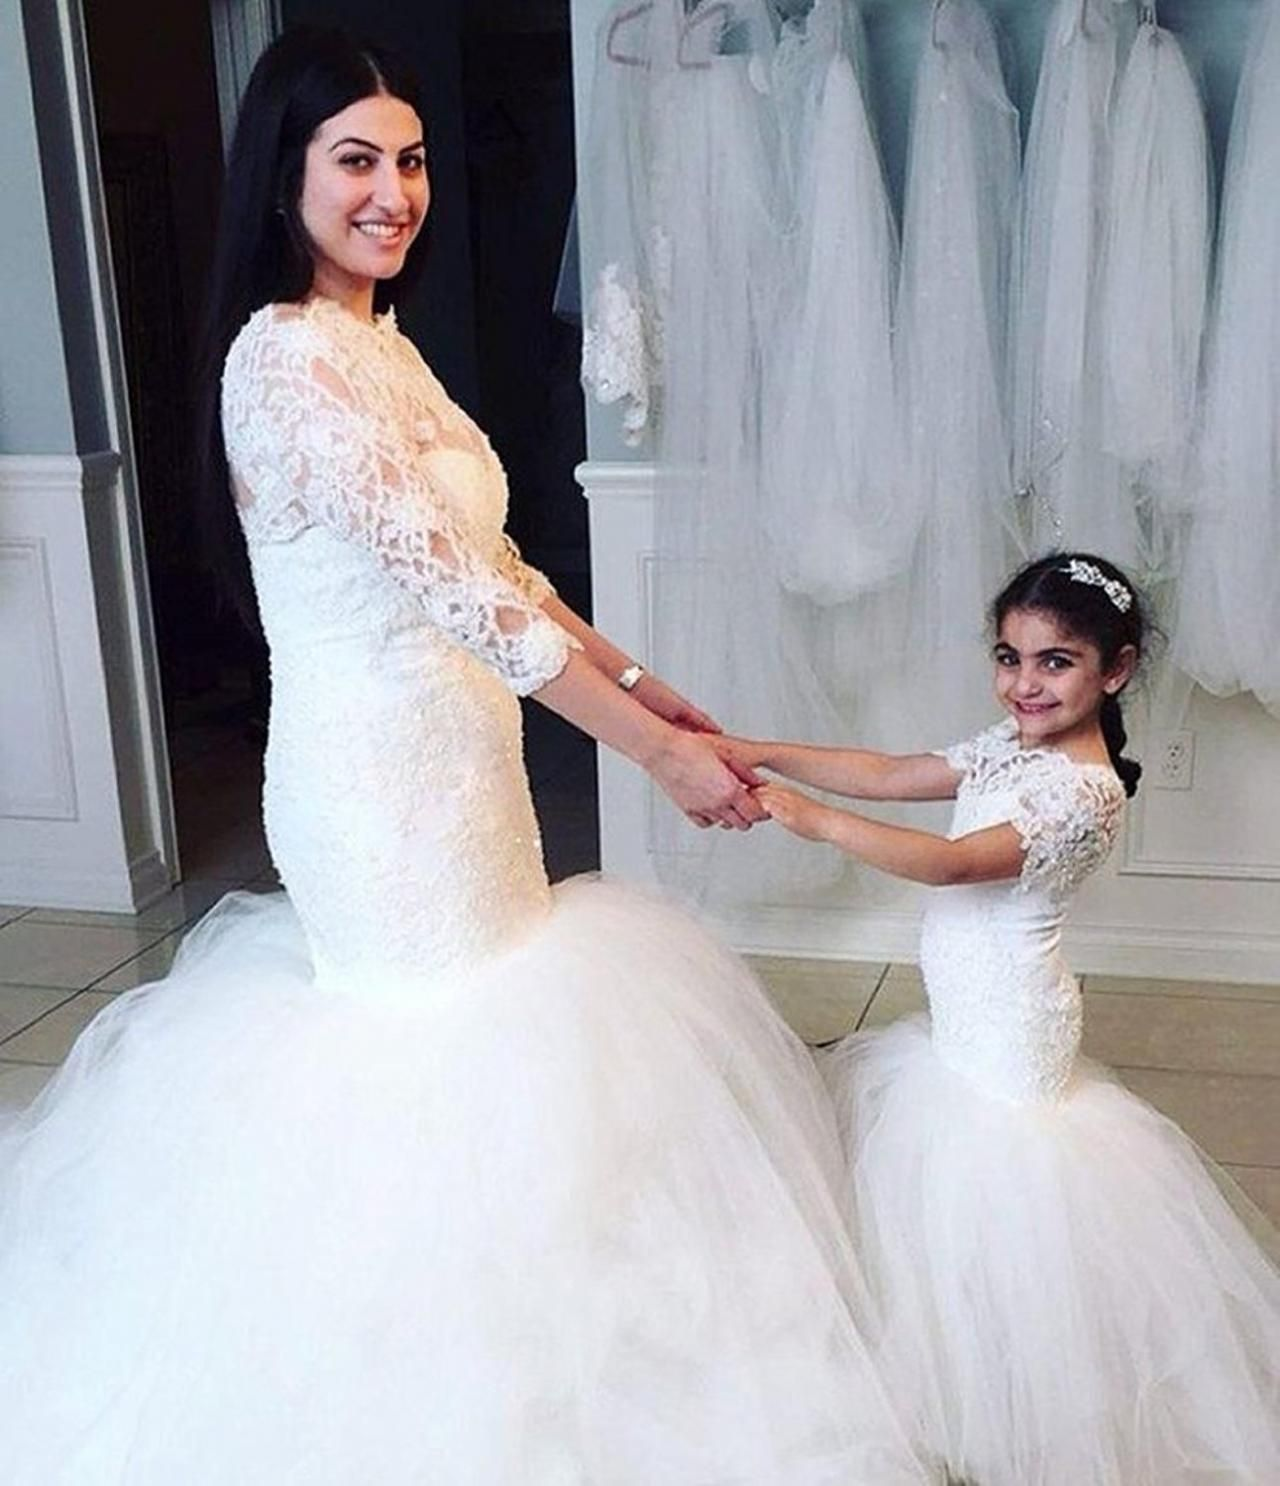 Princess flower girl dresses short sleeves mermaid lace christening